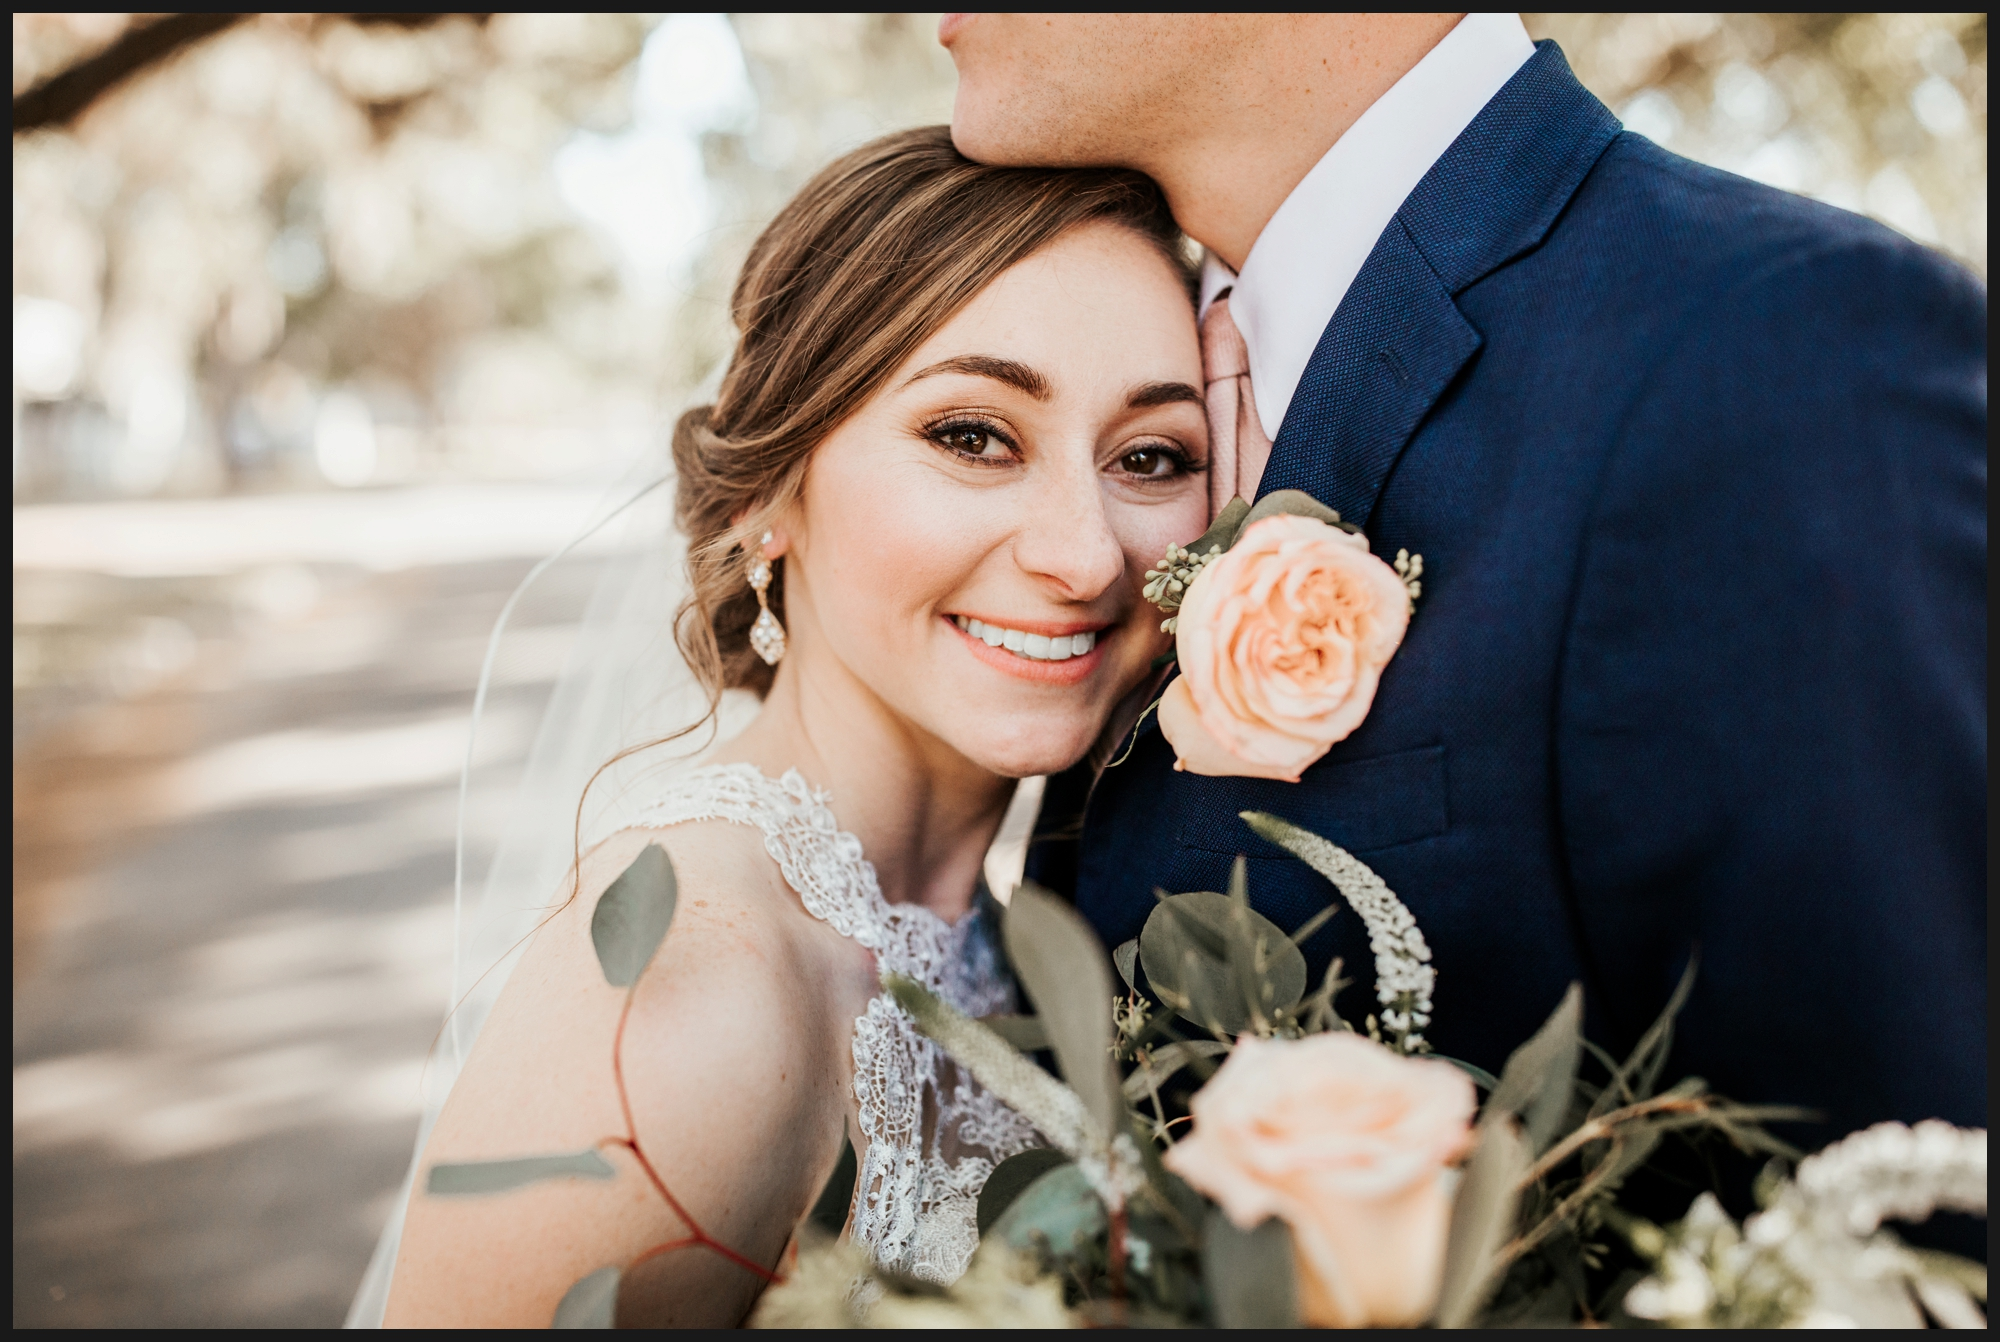 Orlando-Wedding-Photographer-destination-wedding-photographer-florida-wedding-photographer-bohemian-wedding-photographer_1758.jpg